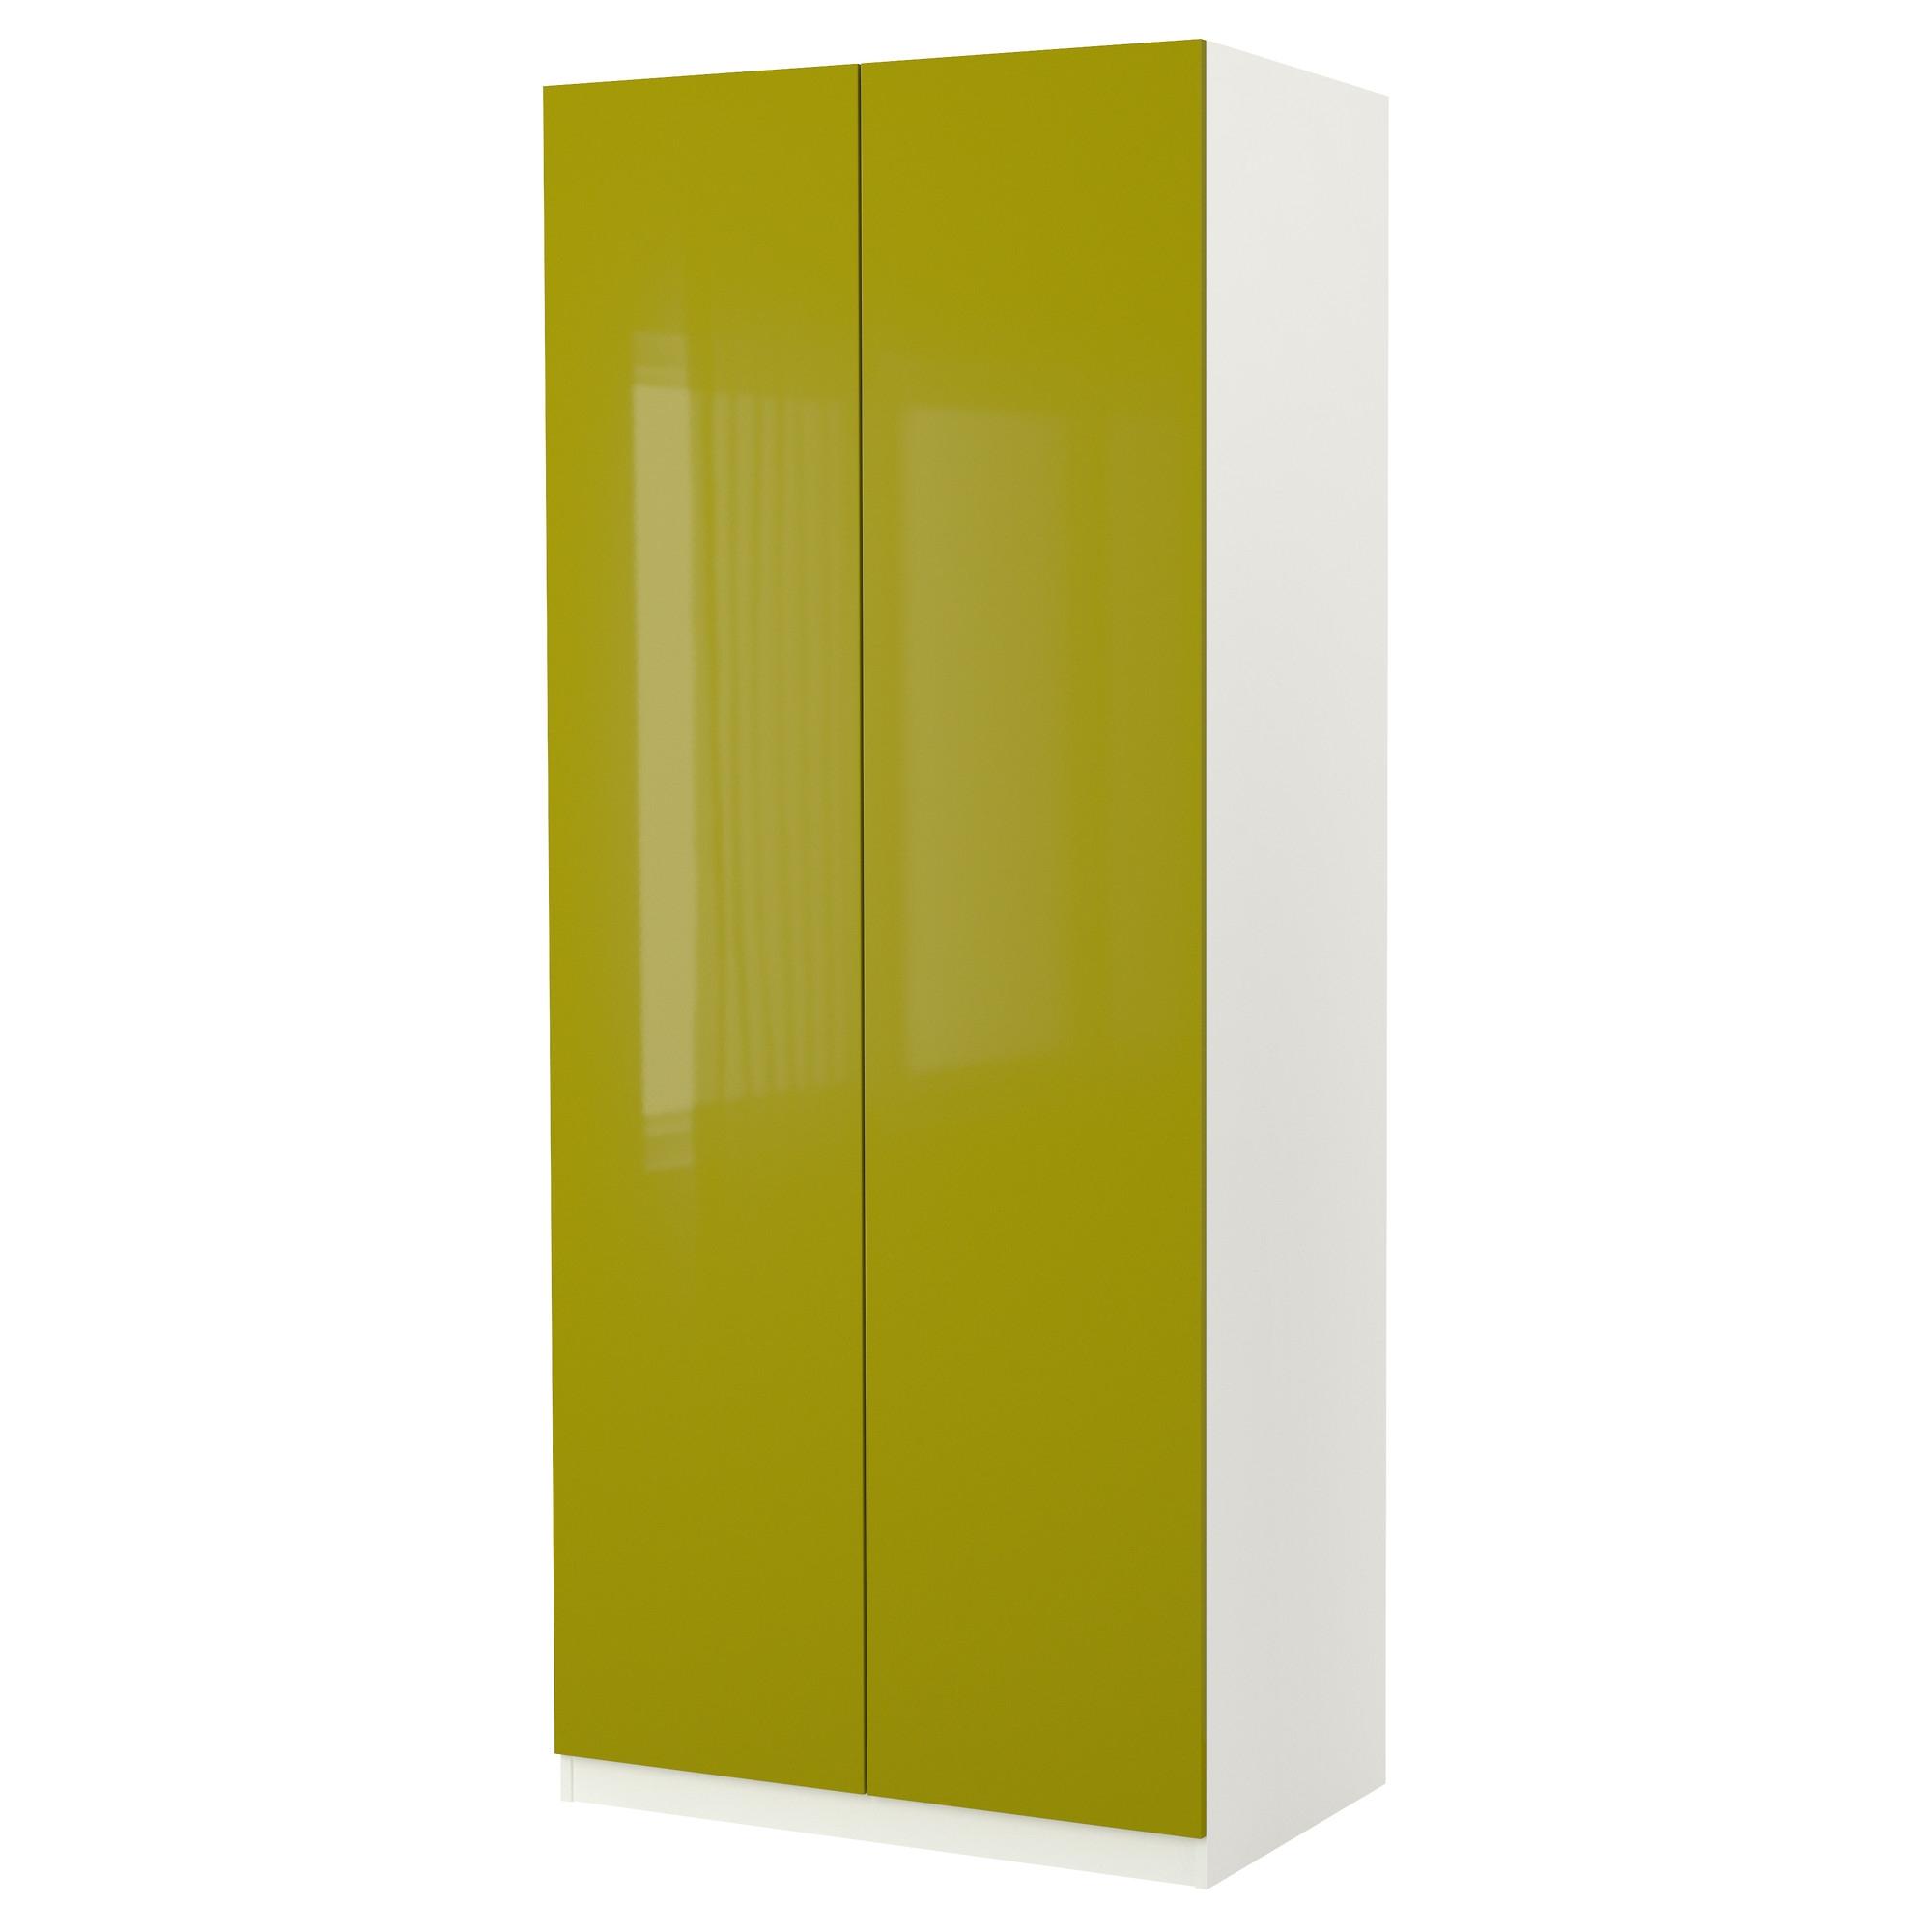 Ikea tenerife detalles producto - Armarios modulares ikea ...